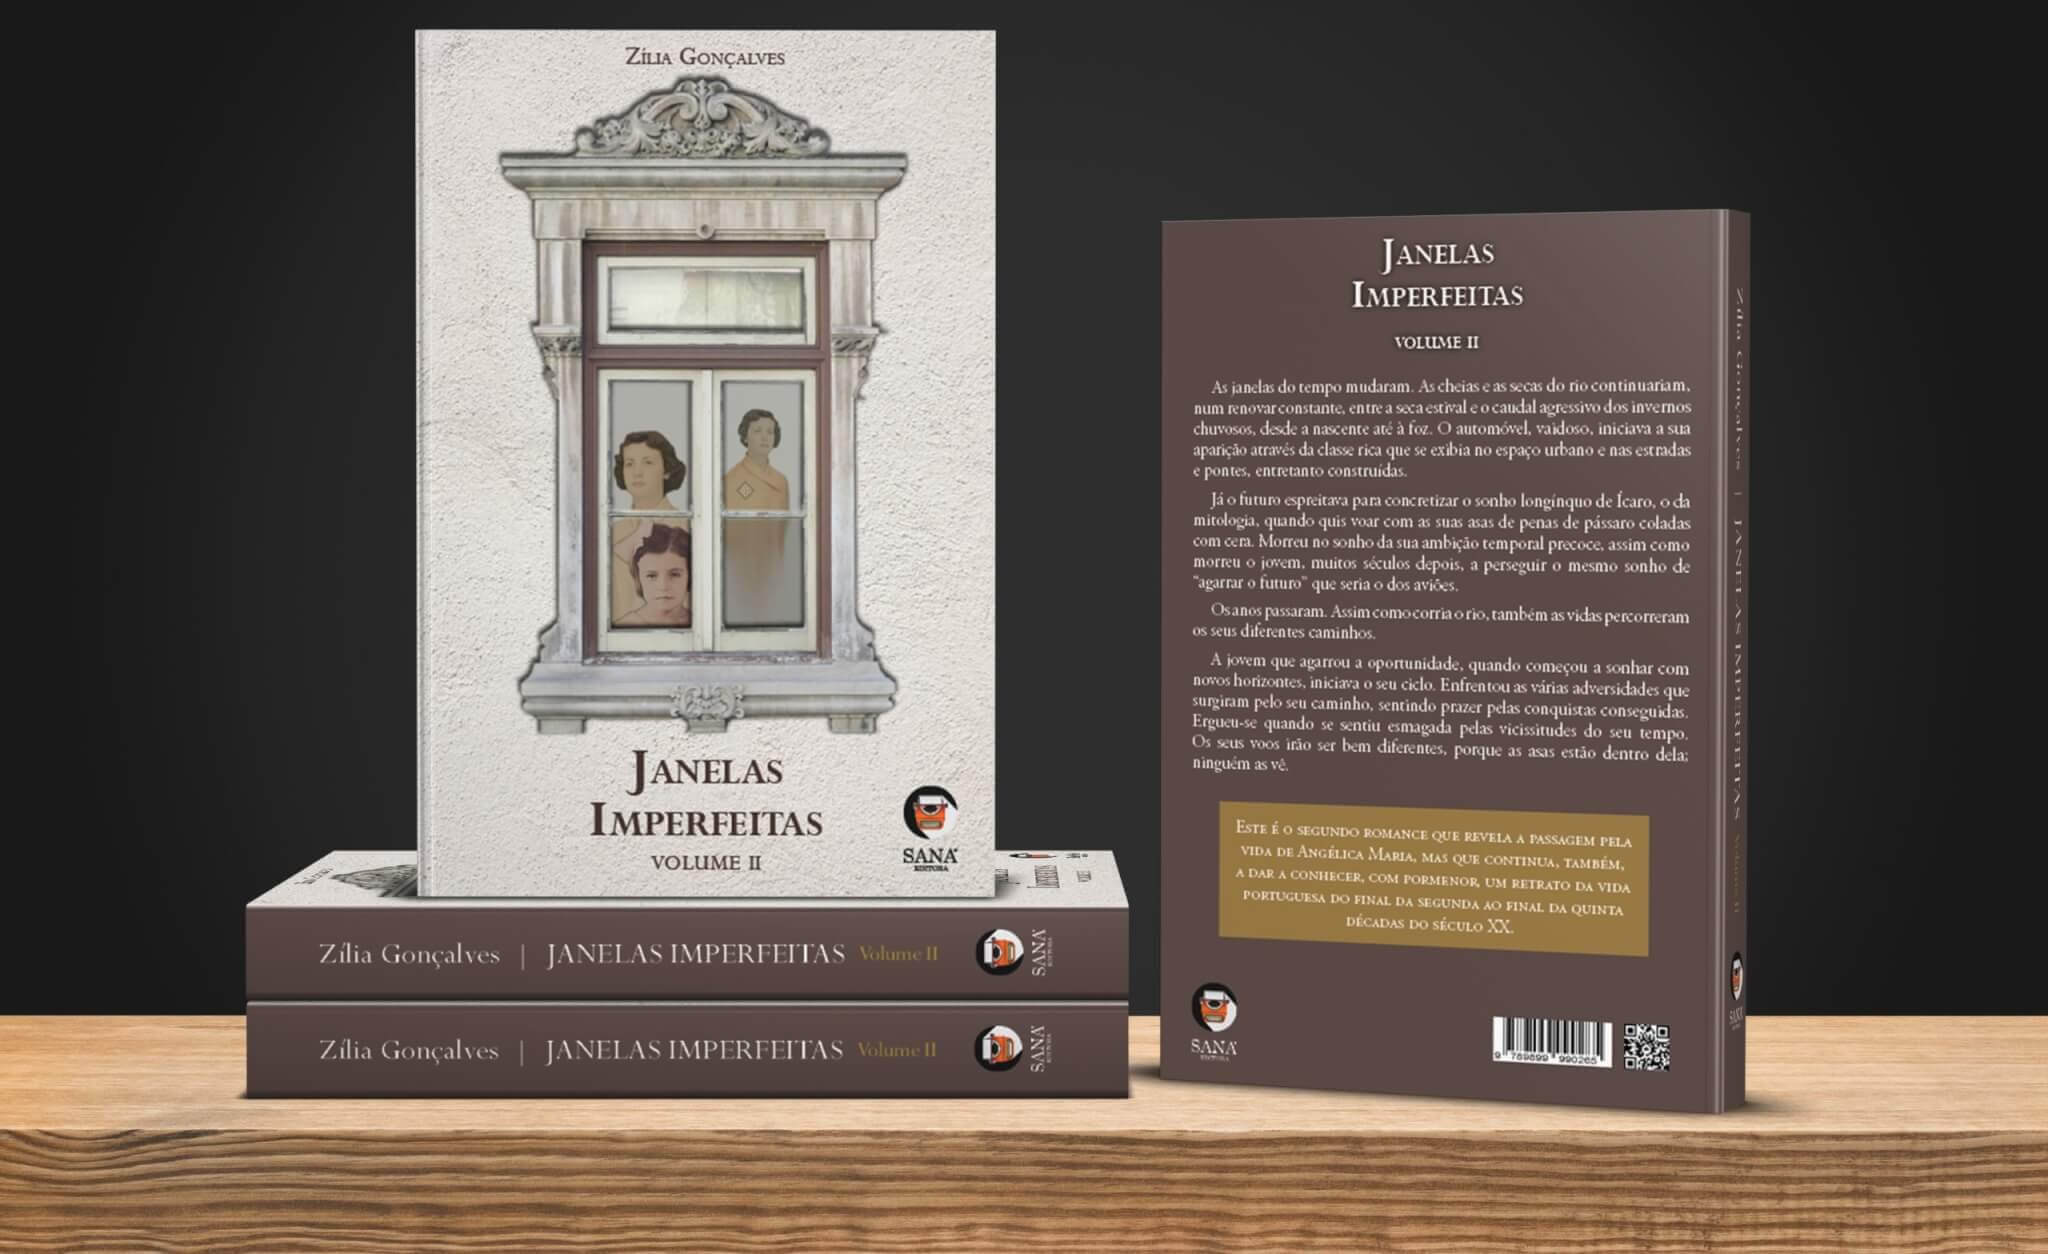 Janelas Imperfeitas de Zília Gonçalves